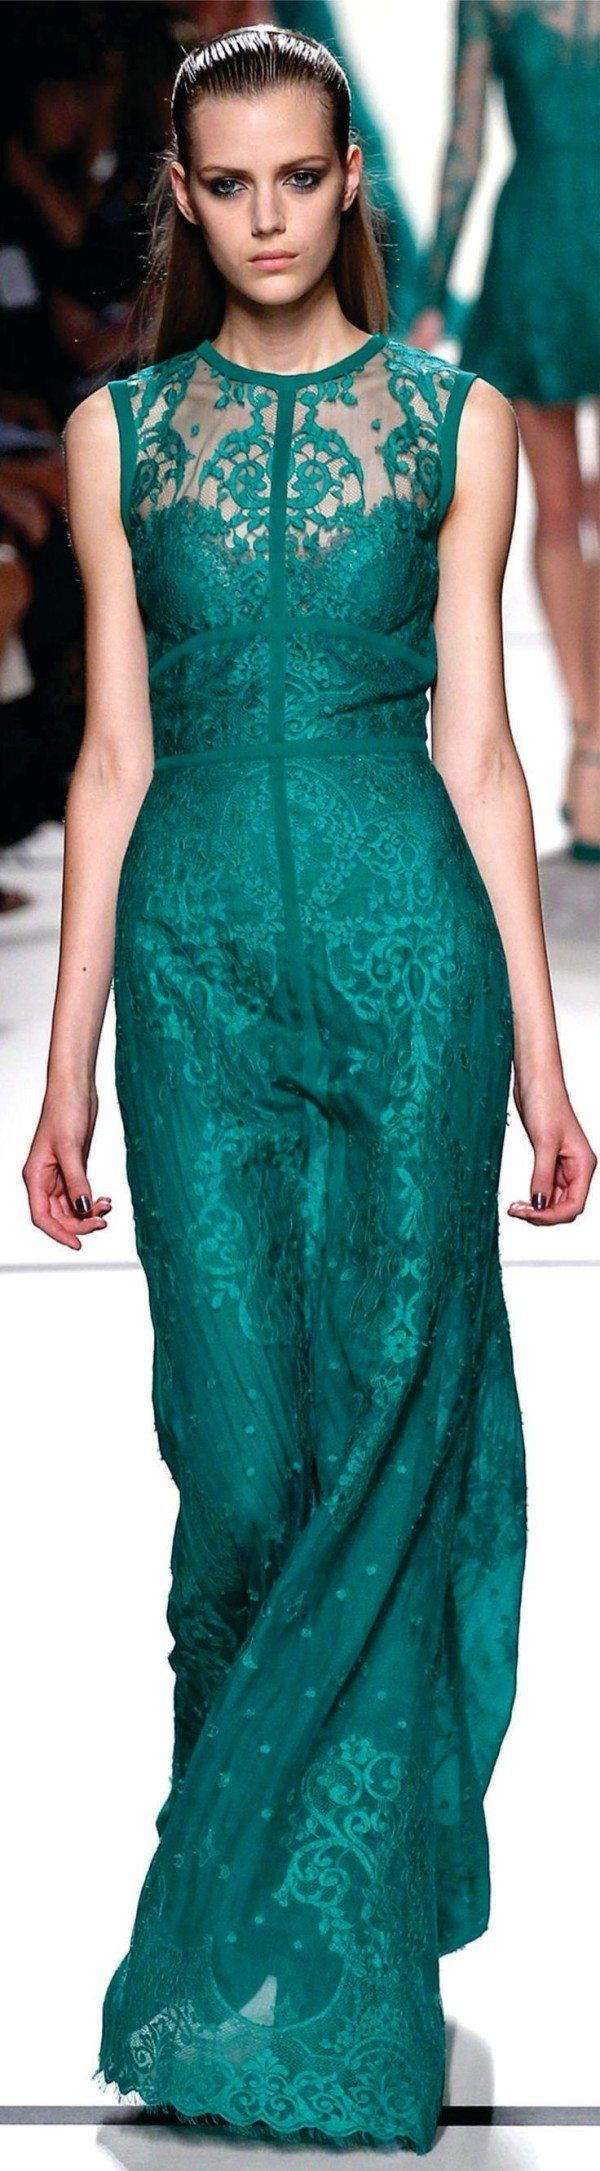 Vestido verde agua para la noche